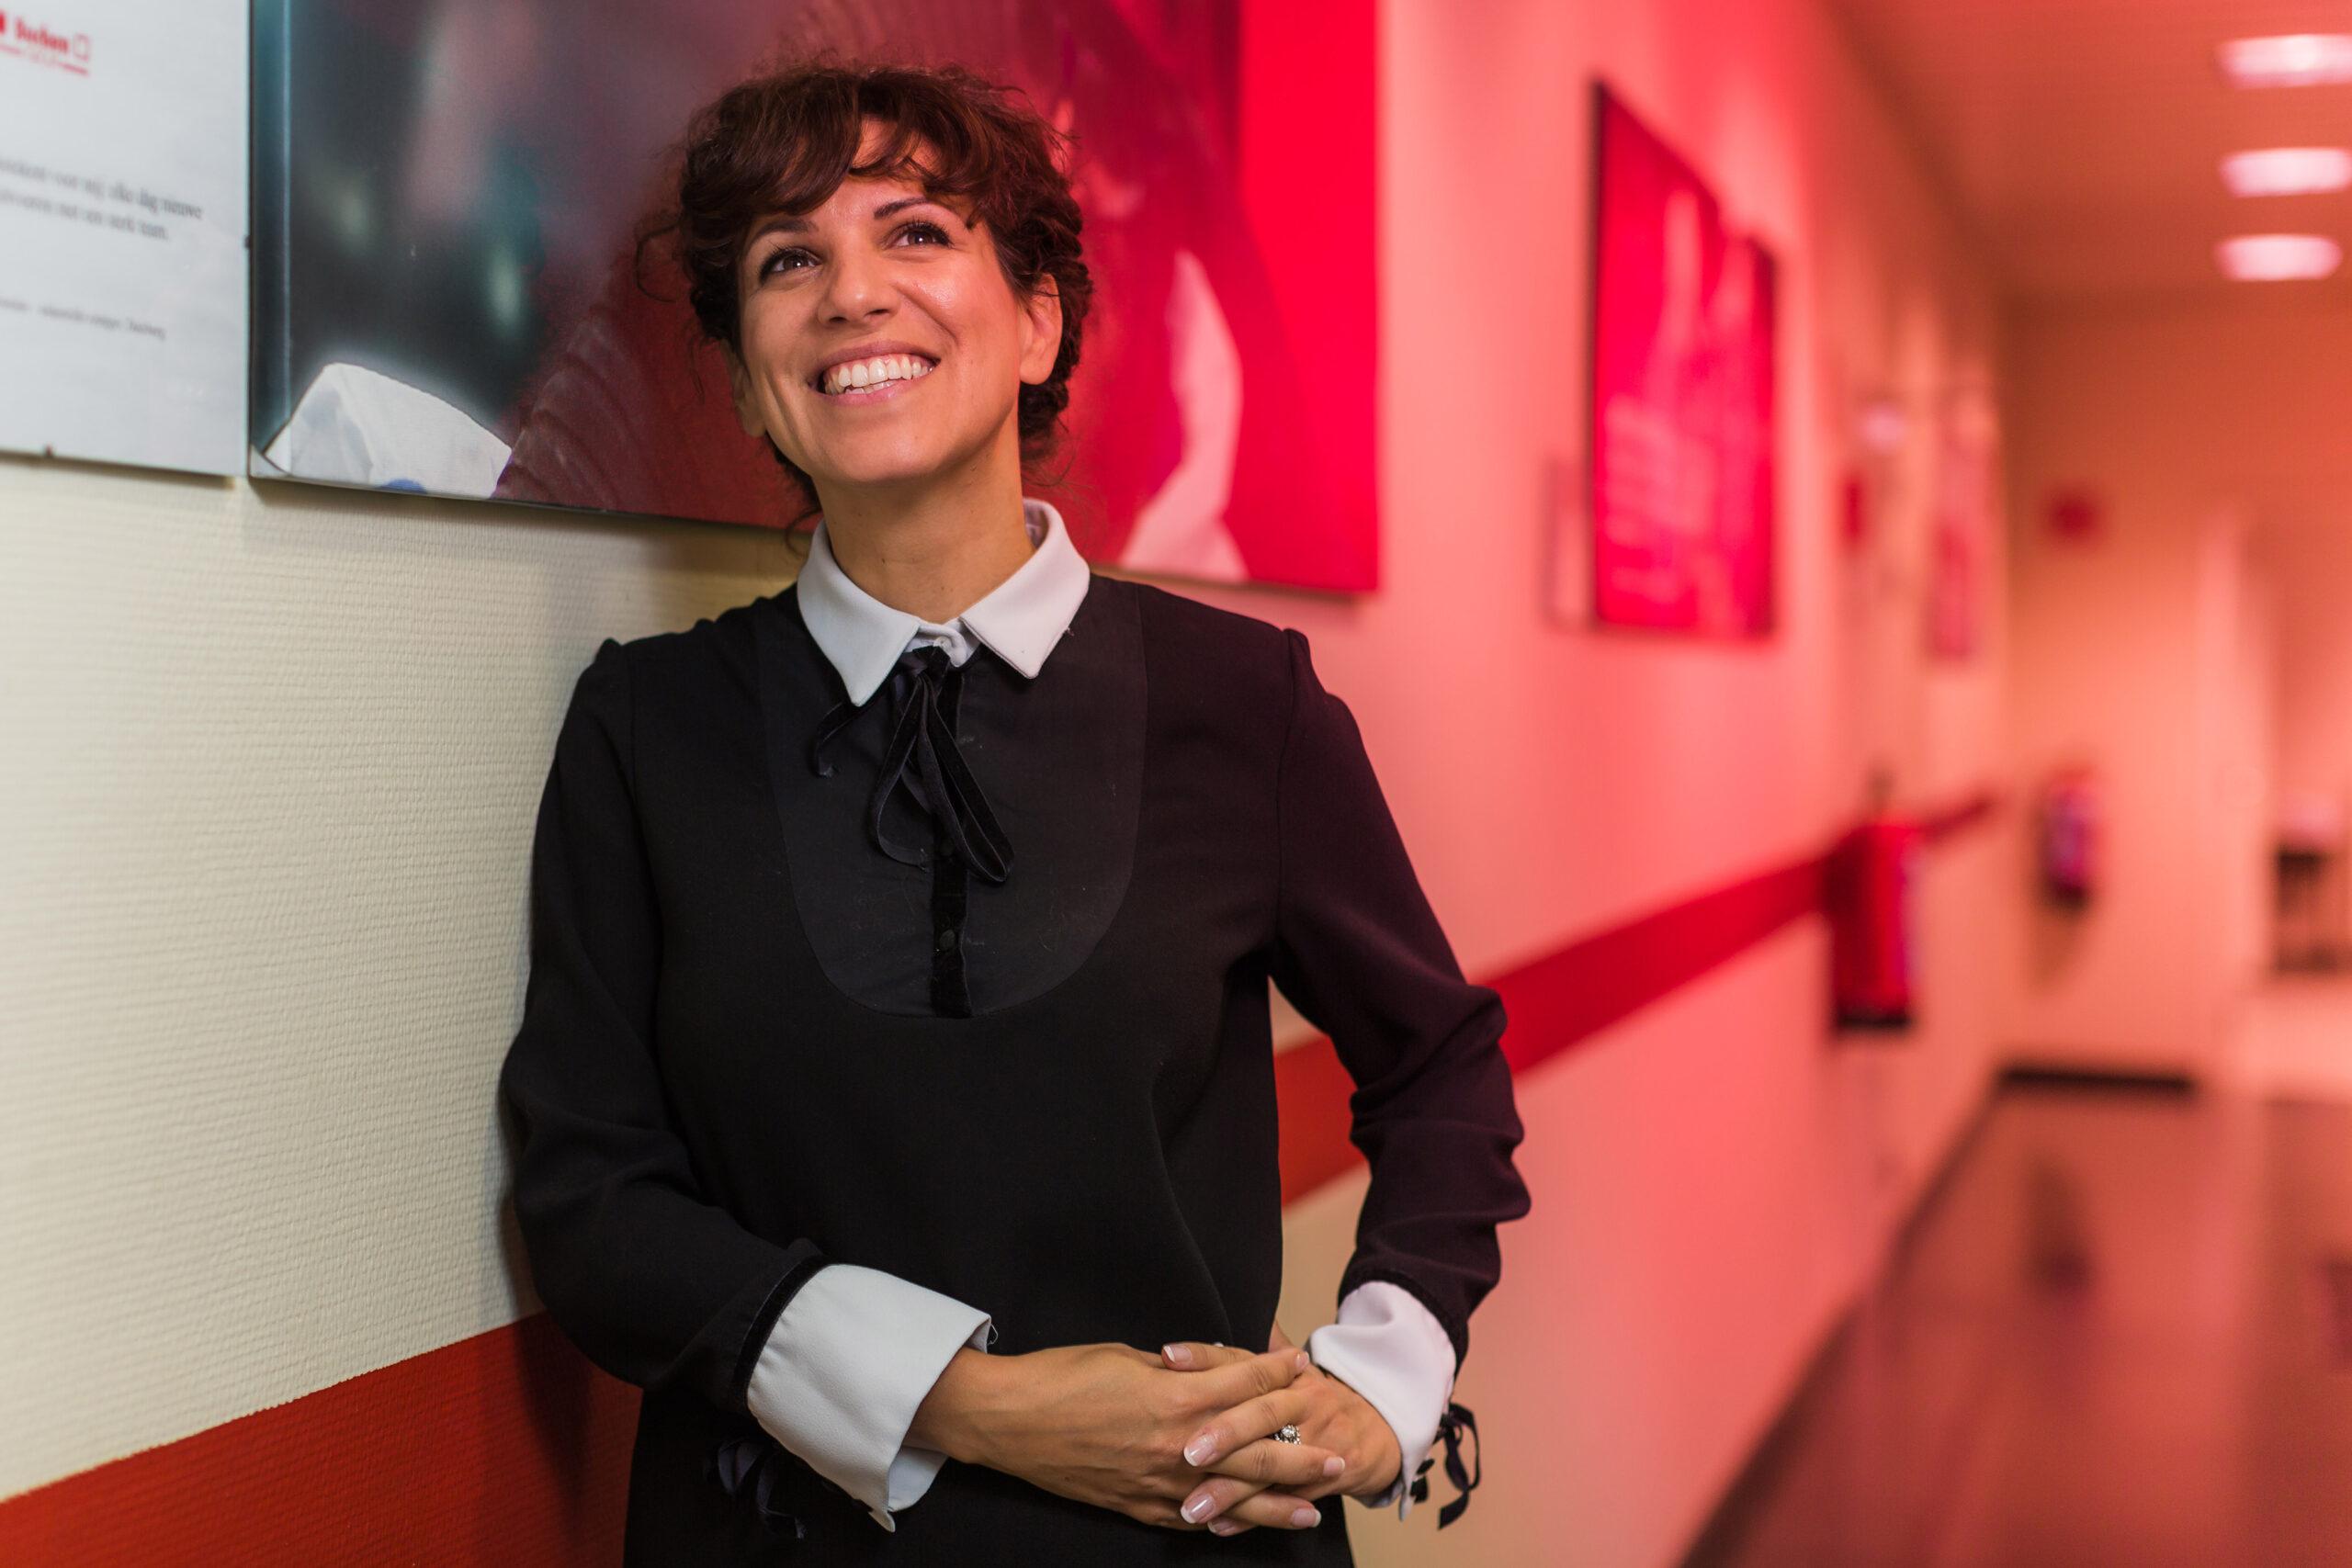 Corporate fotoshoot van Daniela el kadi - CEO van Buchen Group in België